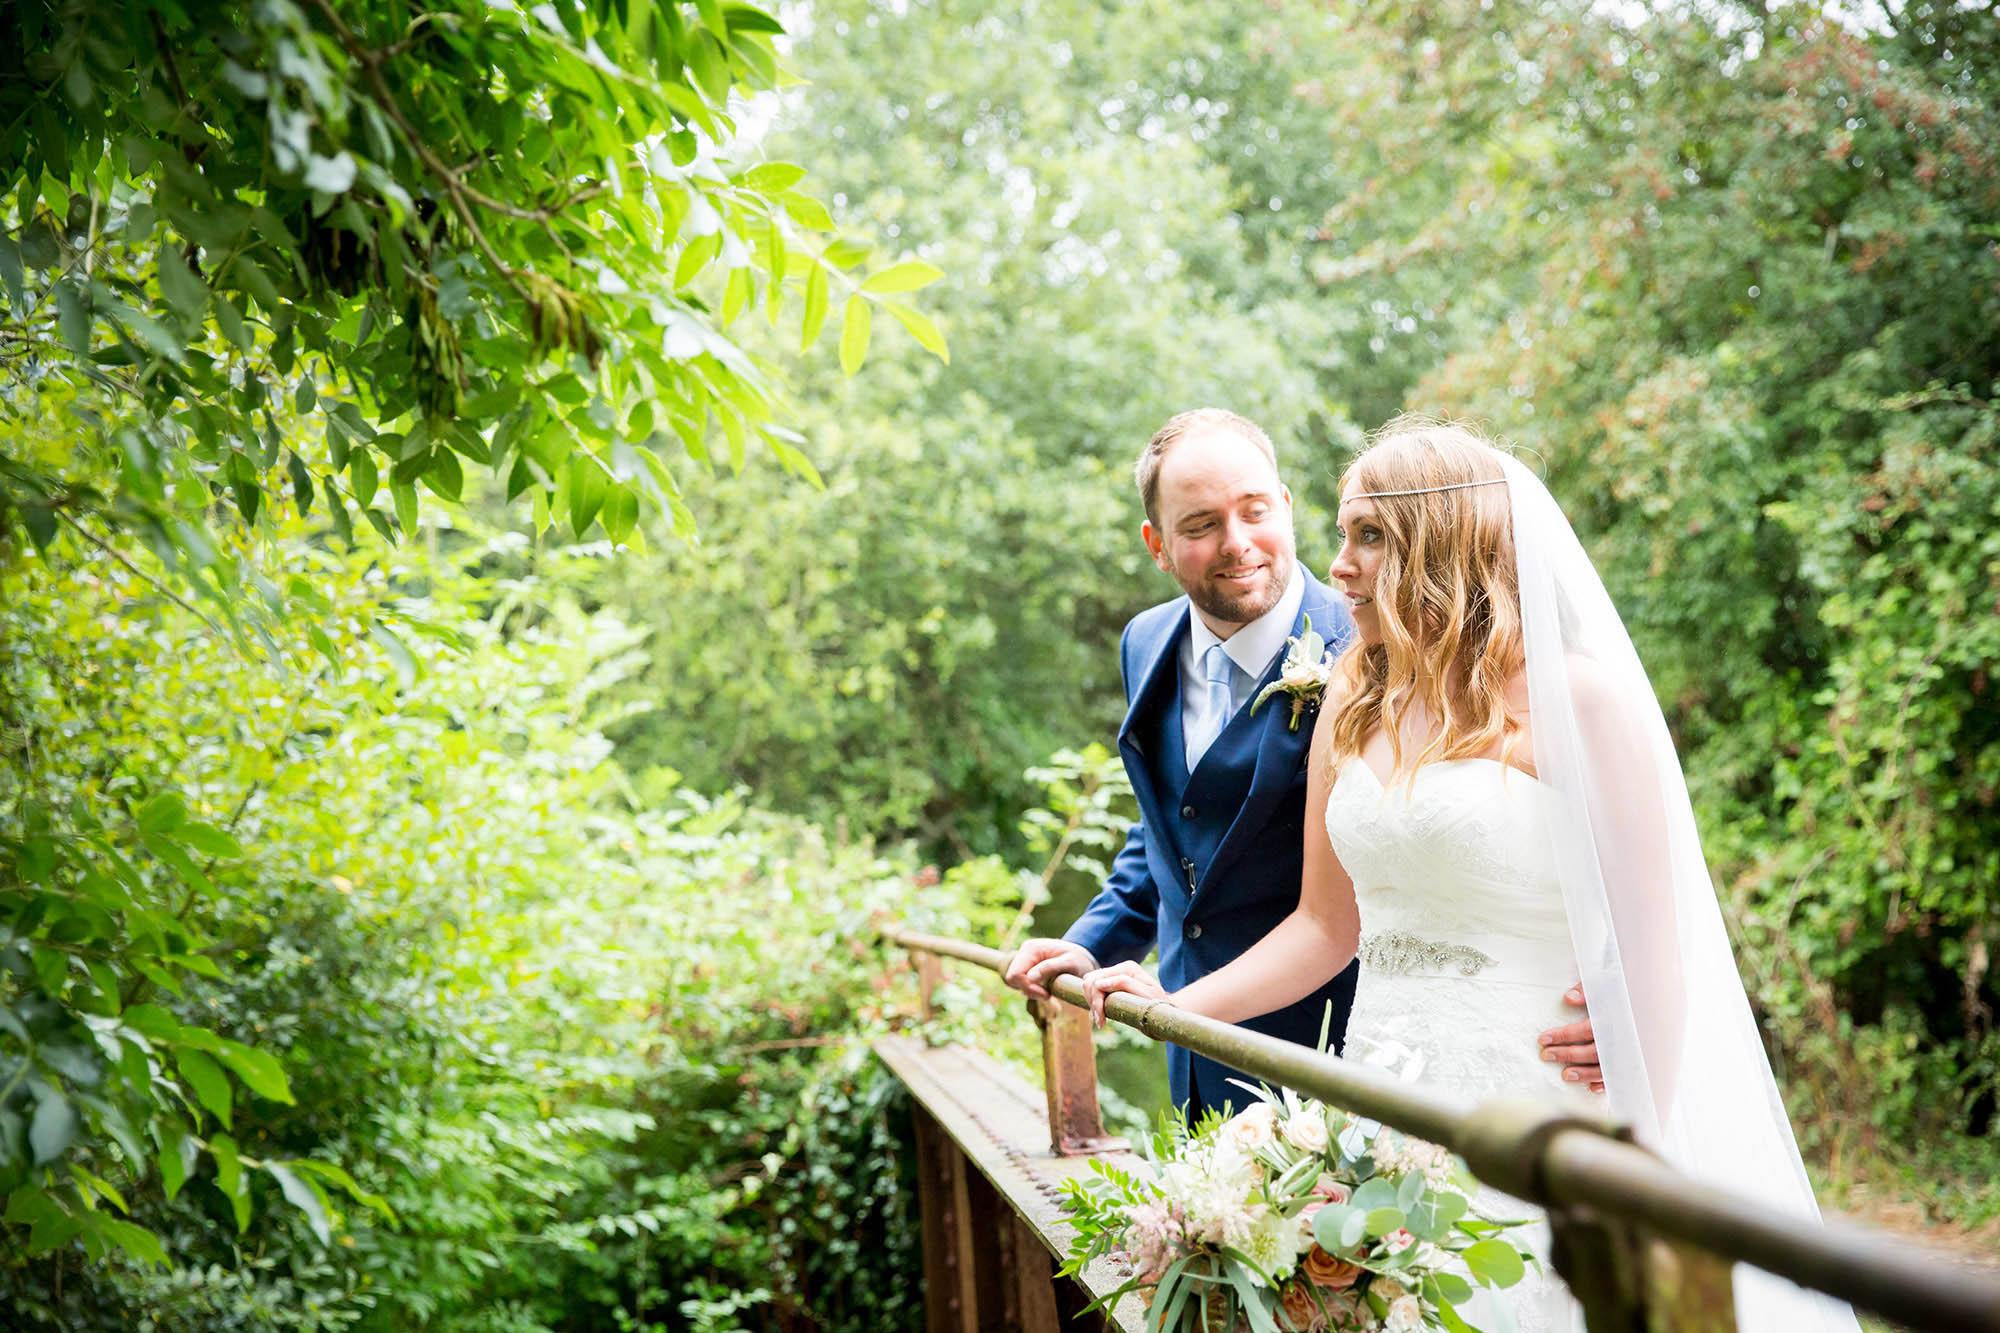 julia-toms-wedding-photographer-west-sussex-008.jpg